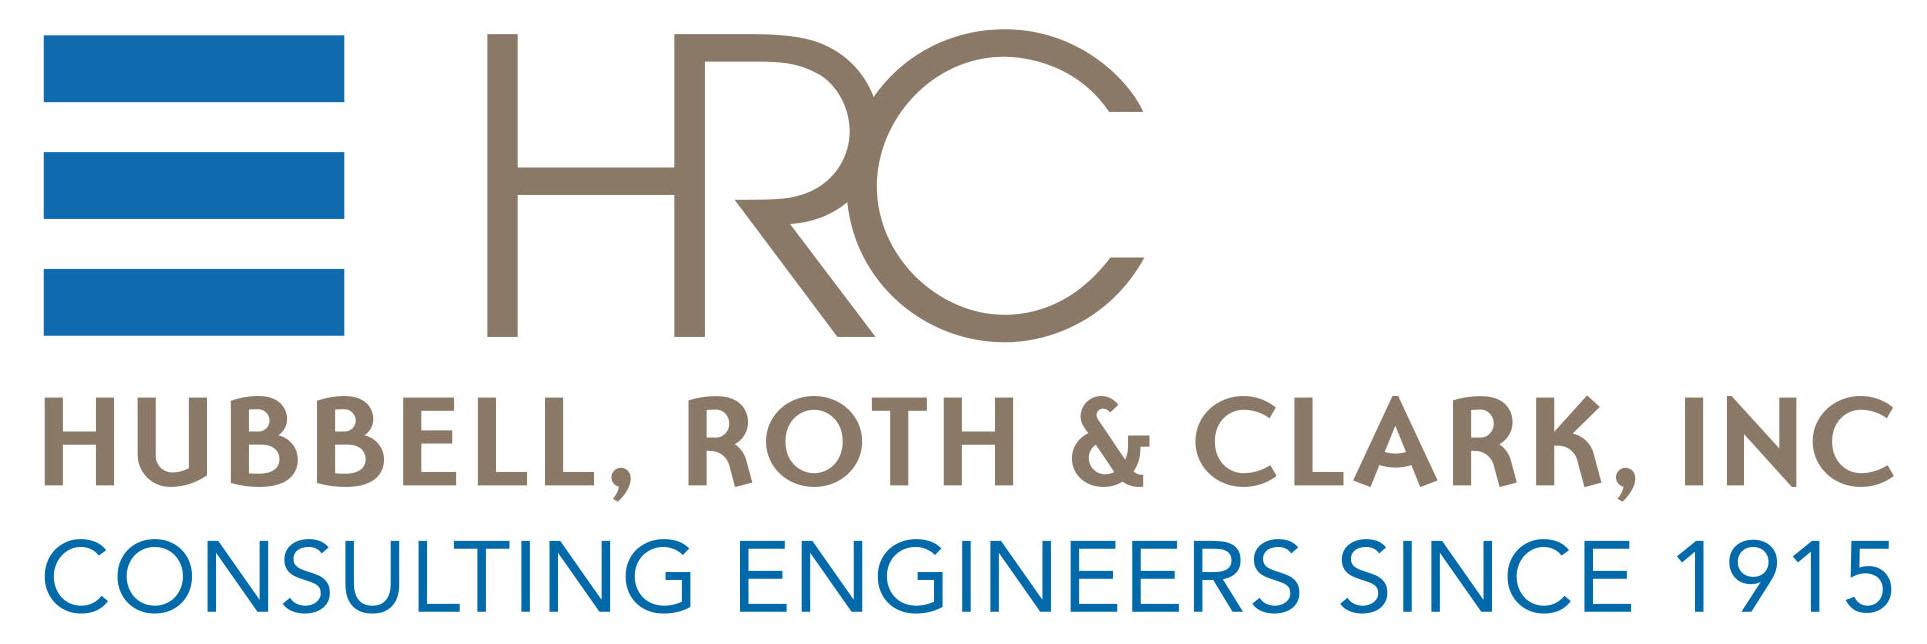 HRC_logo_cmyk UPD.jpg